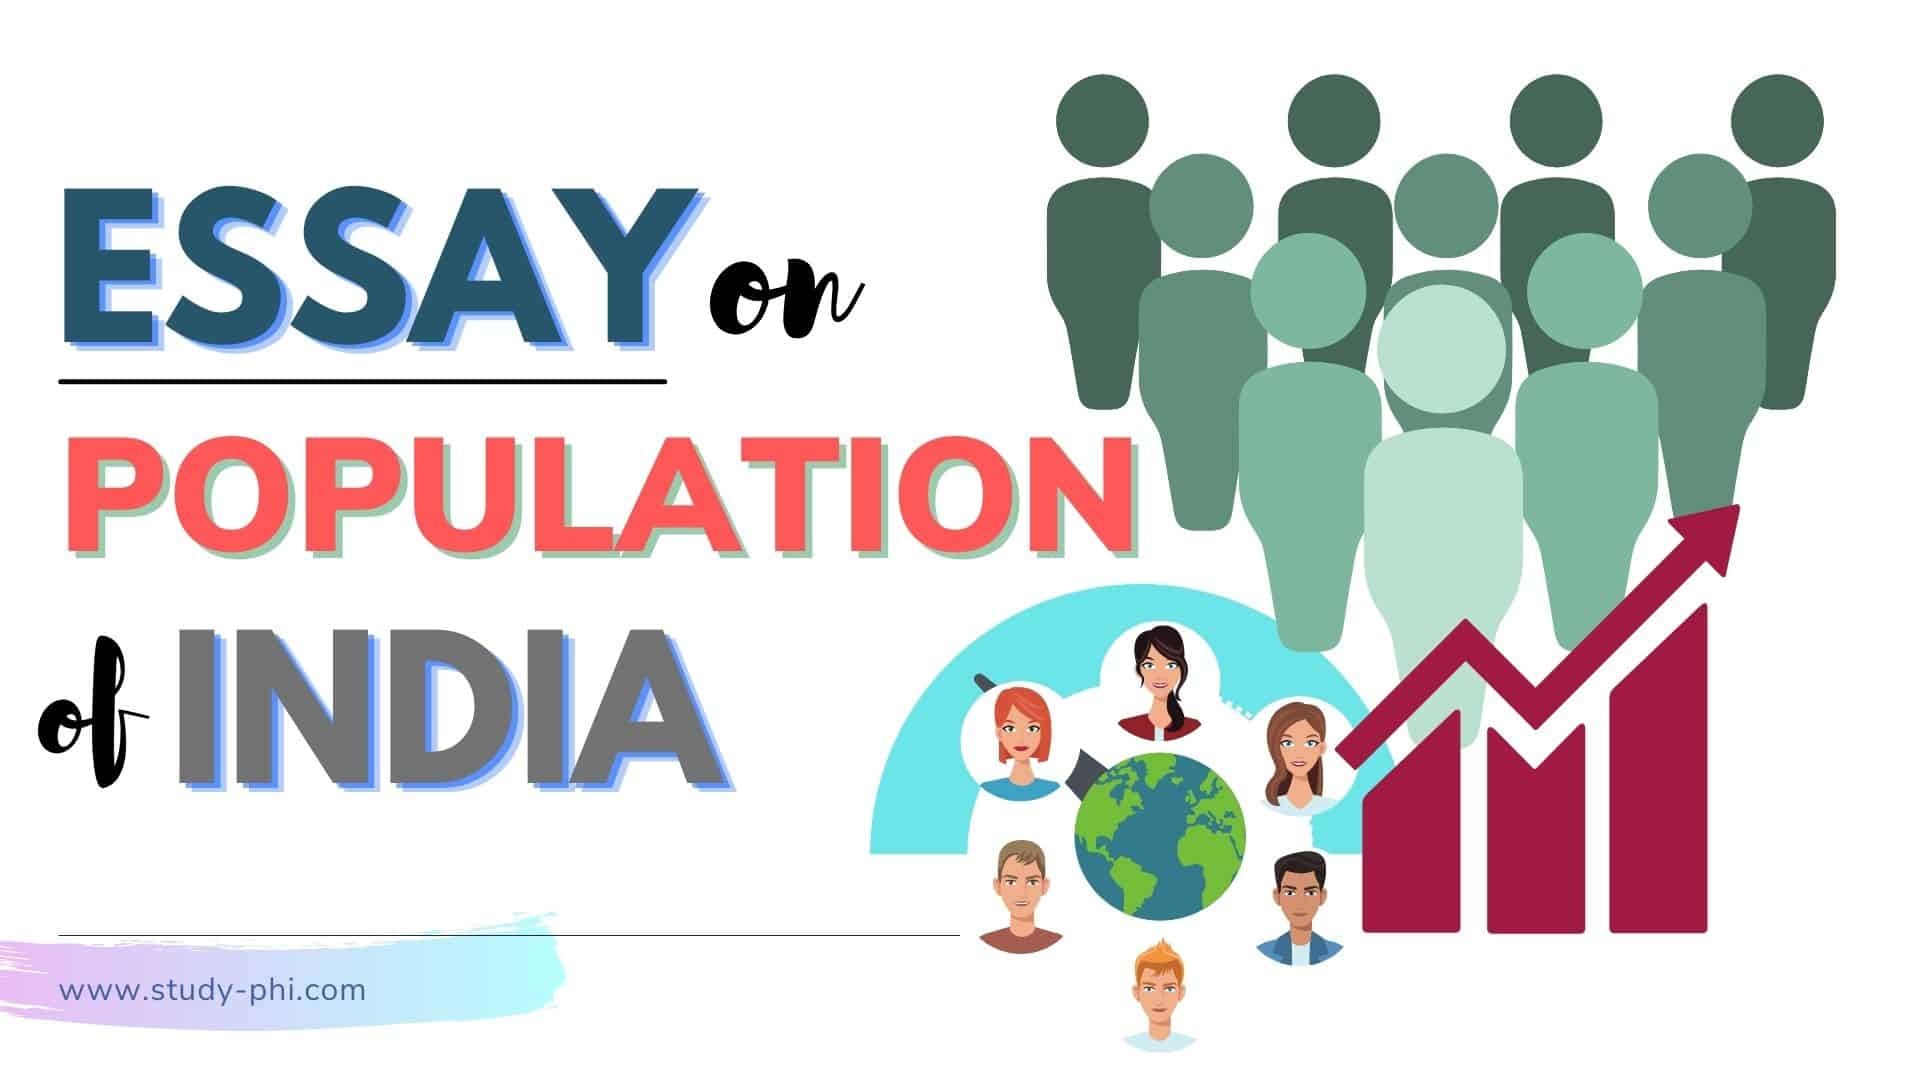 Essay on Population of India